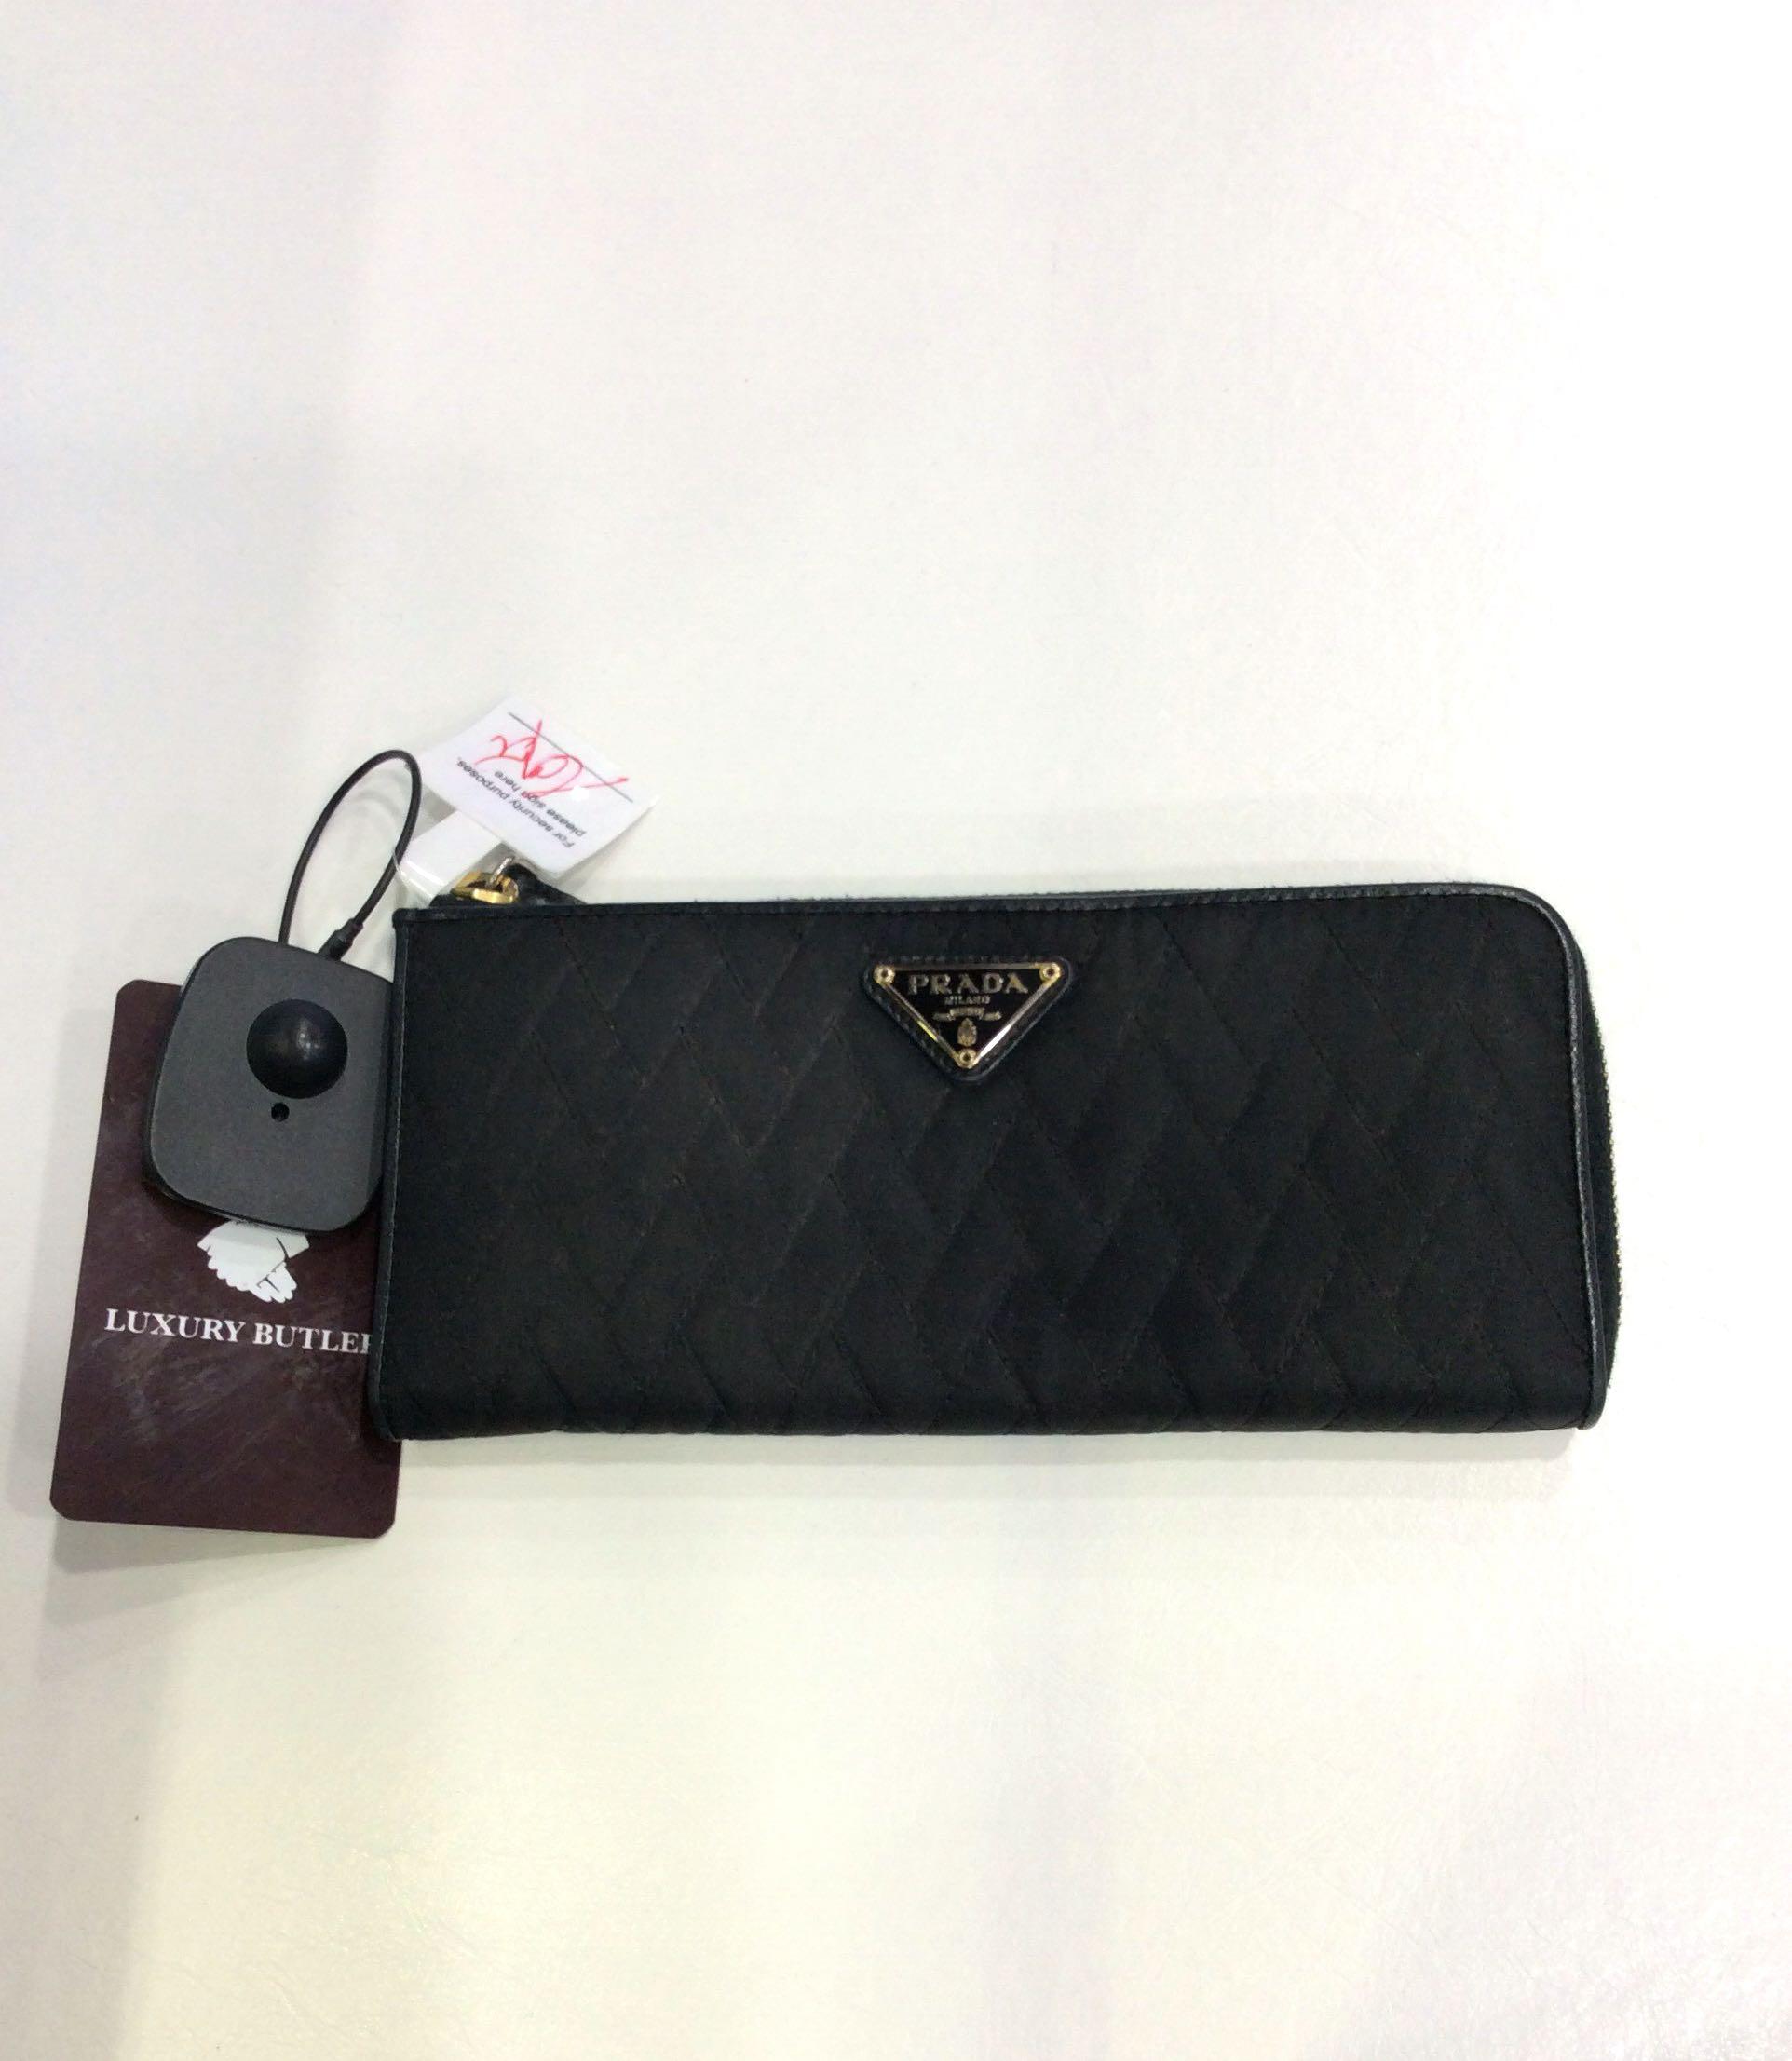 5508eeb2bed0 Preloved Prada Nylon Wallet, Women's Fashion, Bags & Wallets, Wallets on  Carousell